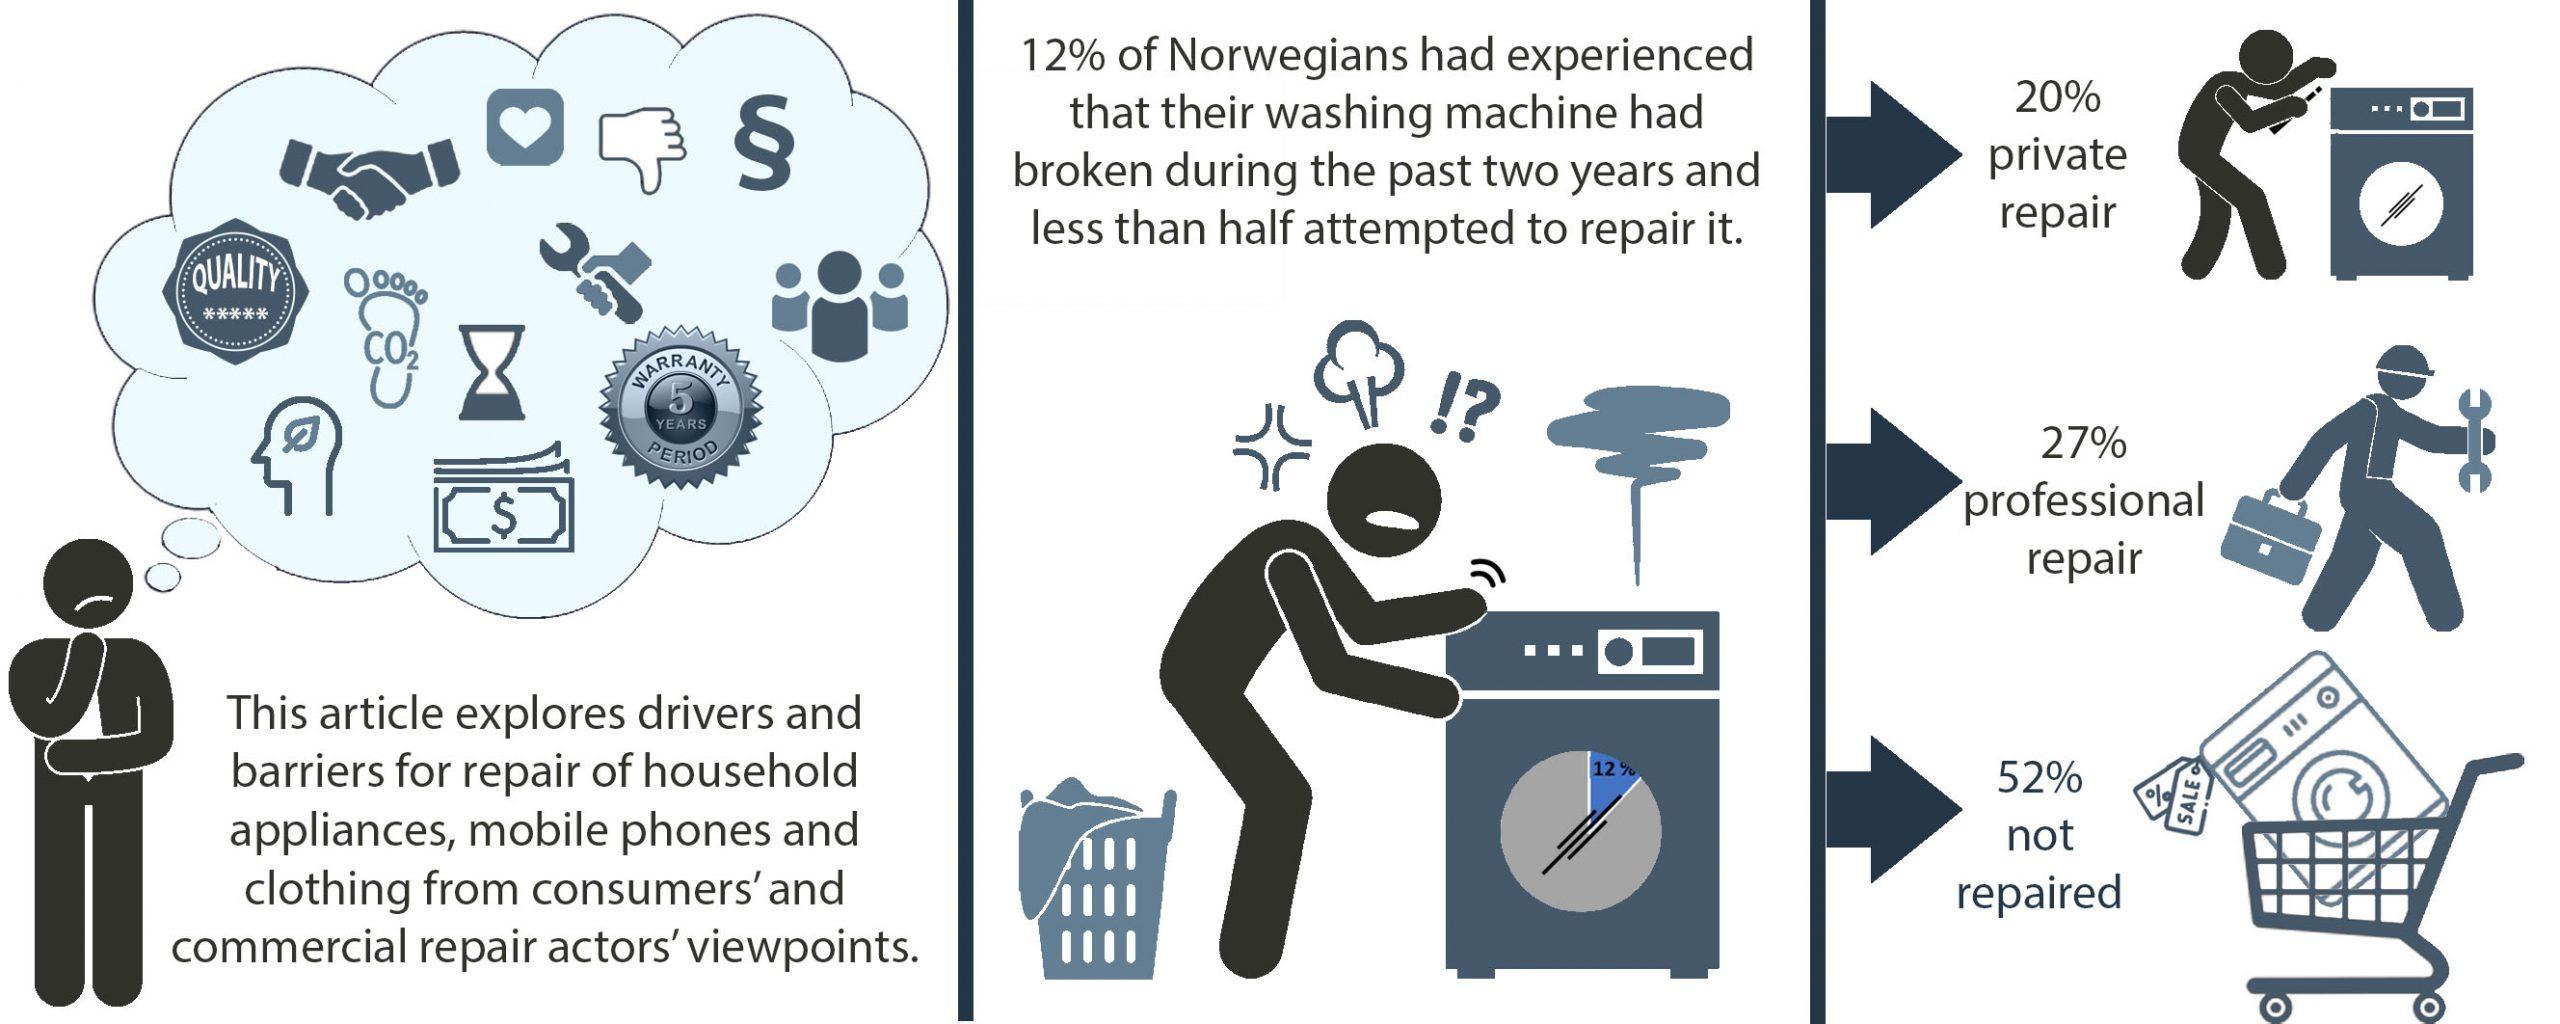 modell som viser hvordan vi reparerer vaskemaskiner i Norge